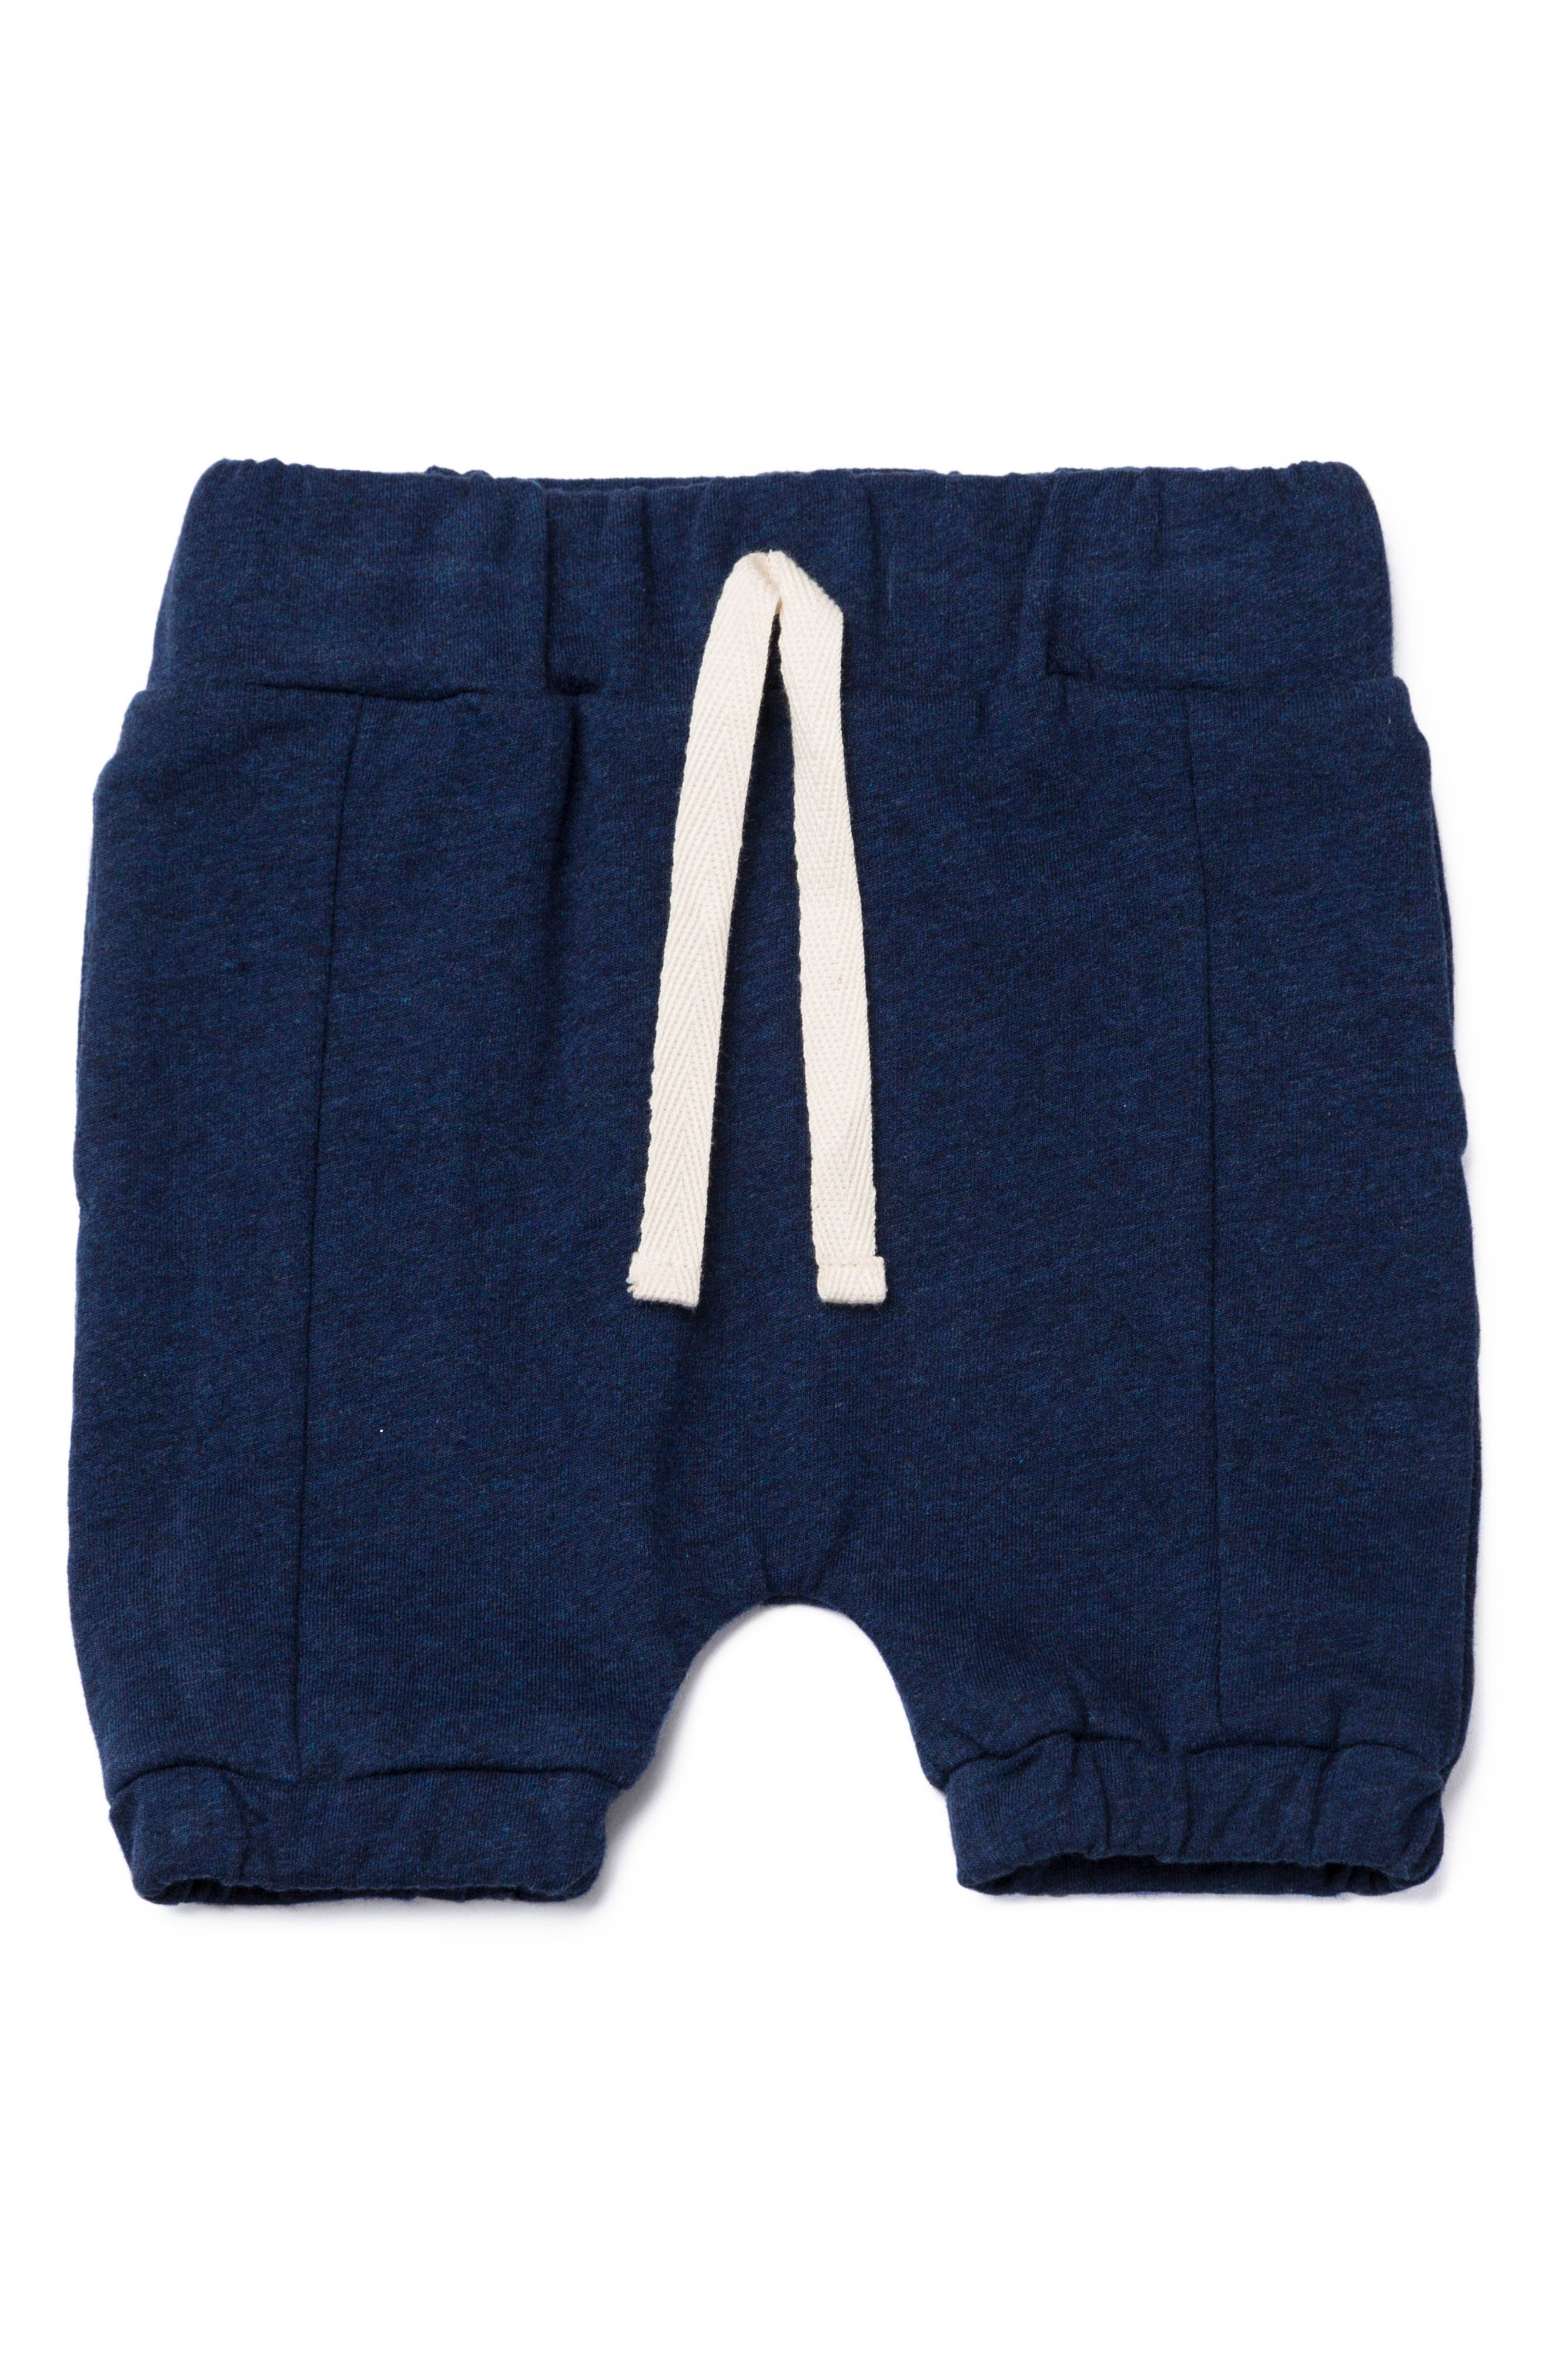 Beach Organic Cotton Jogger Pants,                             Main thumbnail 1, color,                             Navy Heather